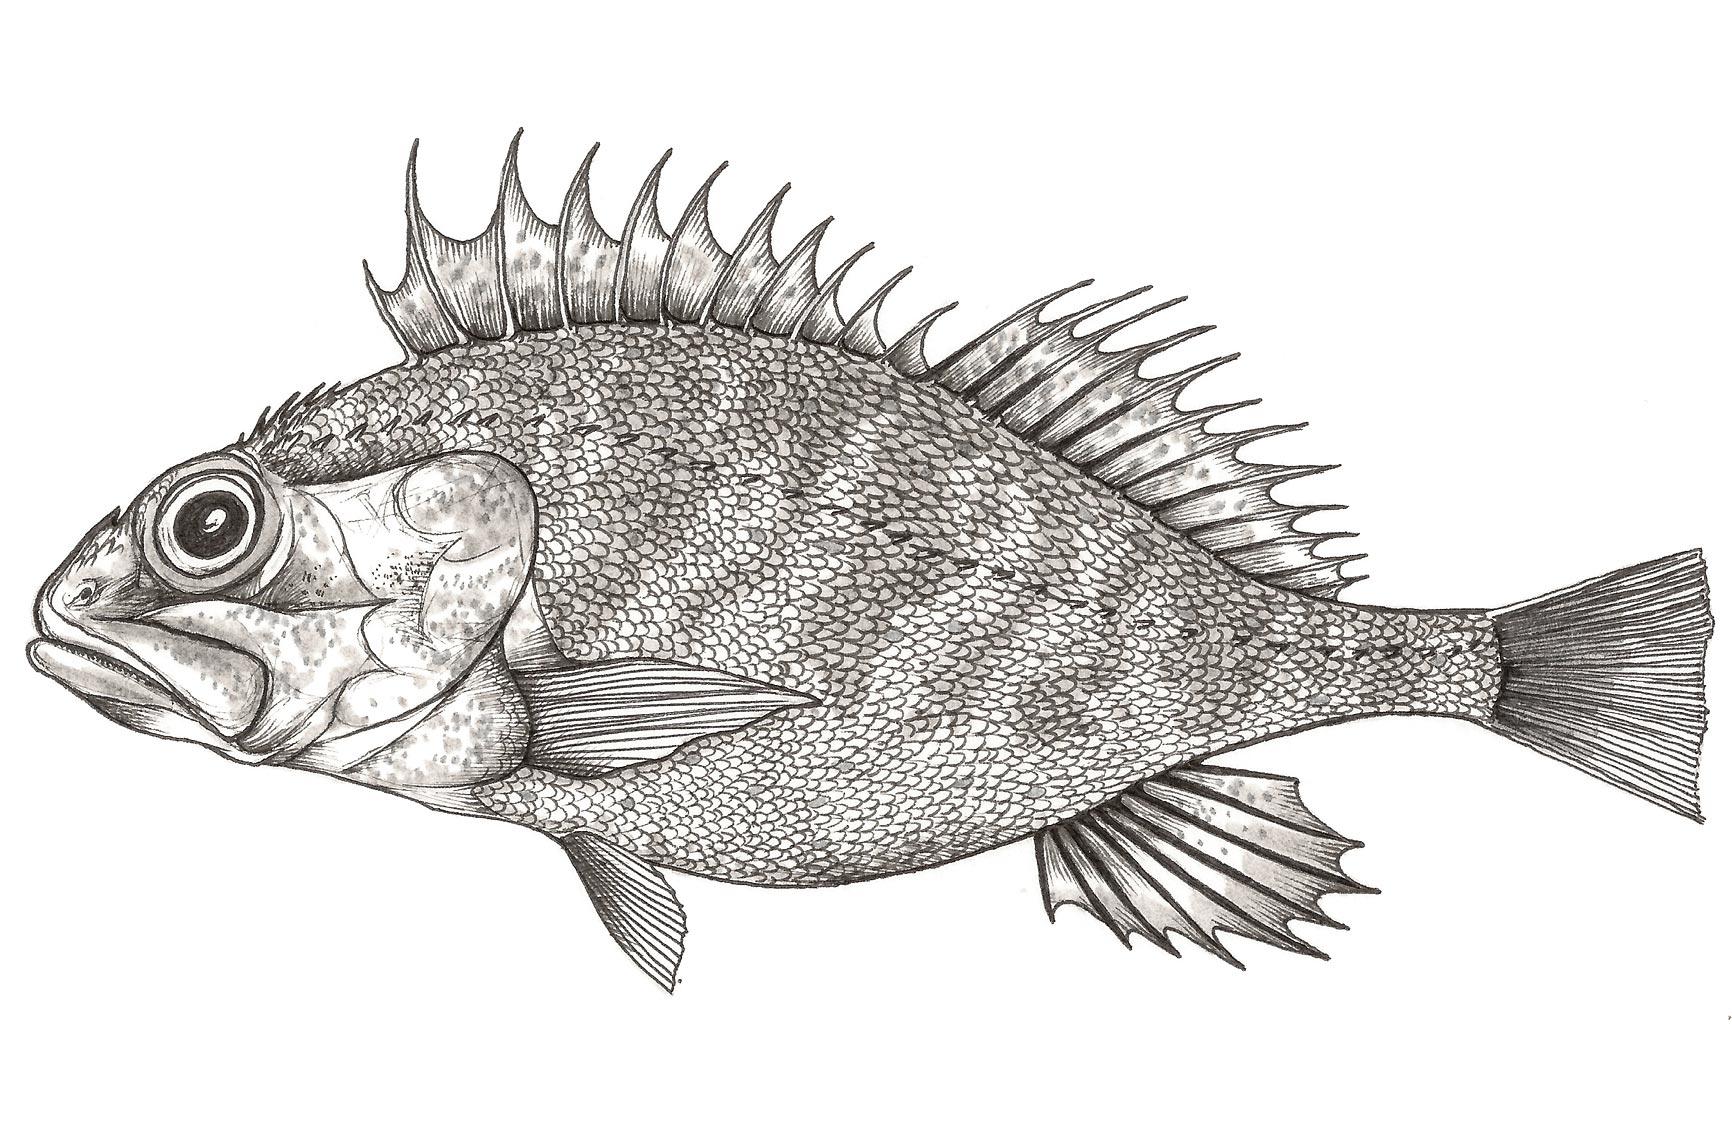 Cabrochu / Cabracho / Rascasse / Red Scorpionfish